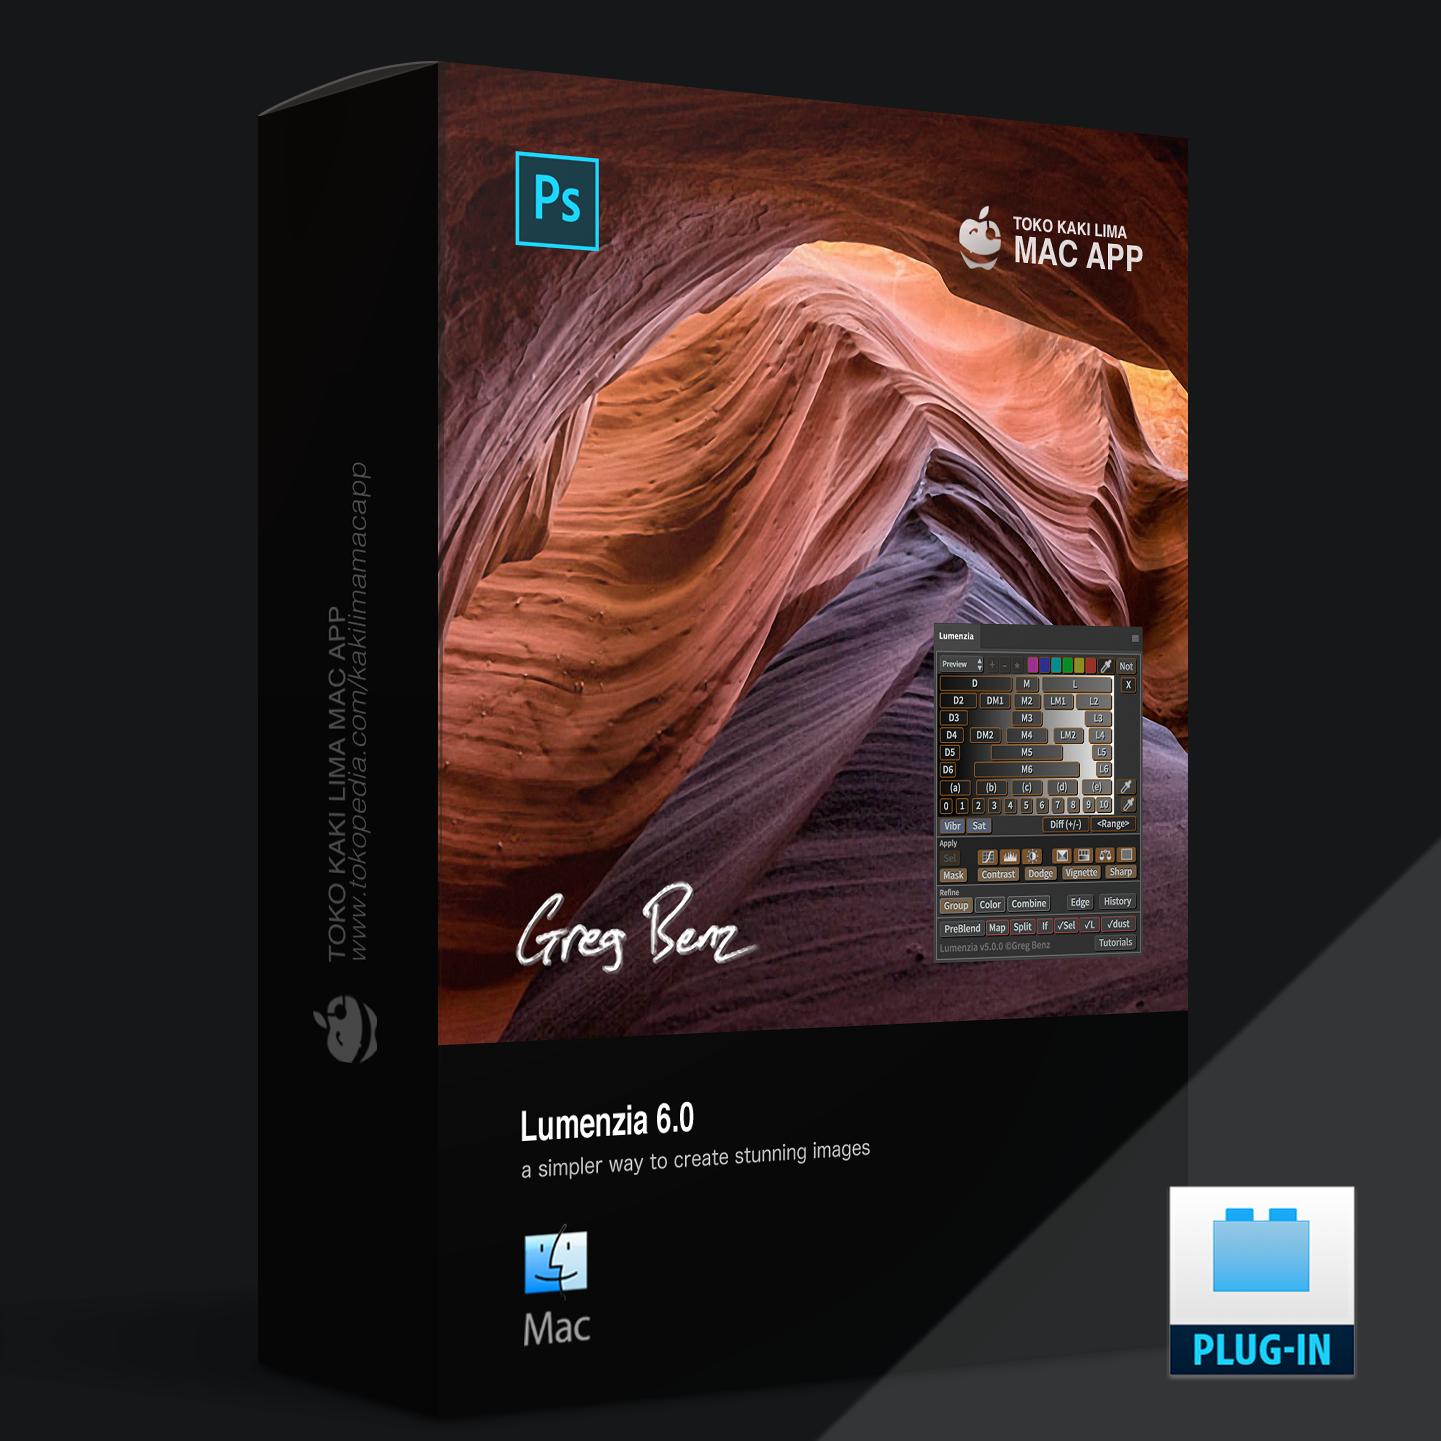 Jual Lumenzia 6 0 Photoshop Plugins - Kaki Lima Mac App